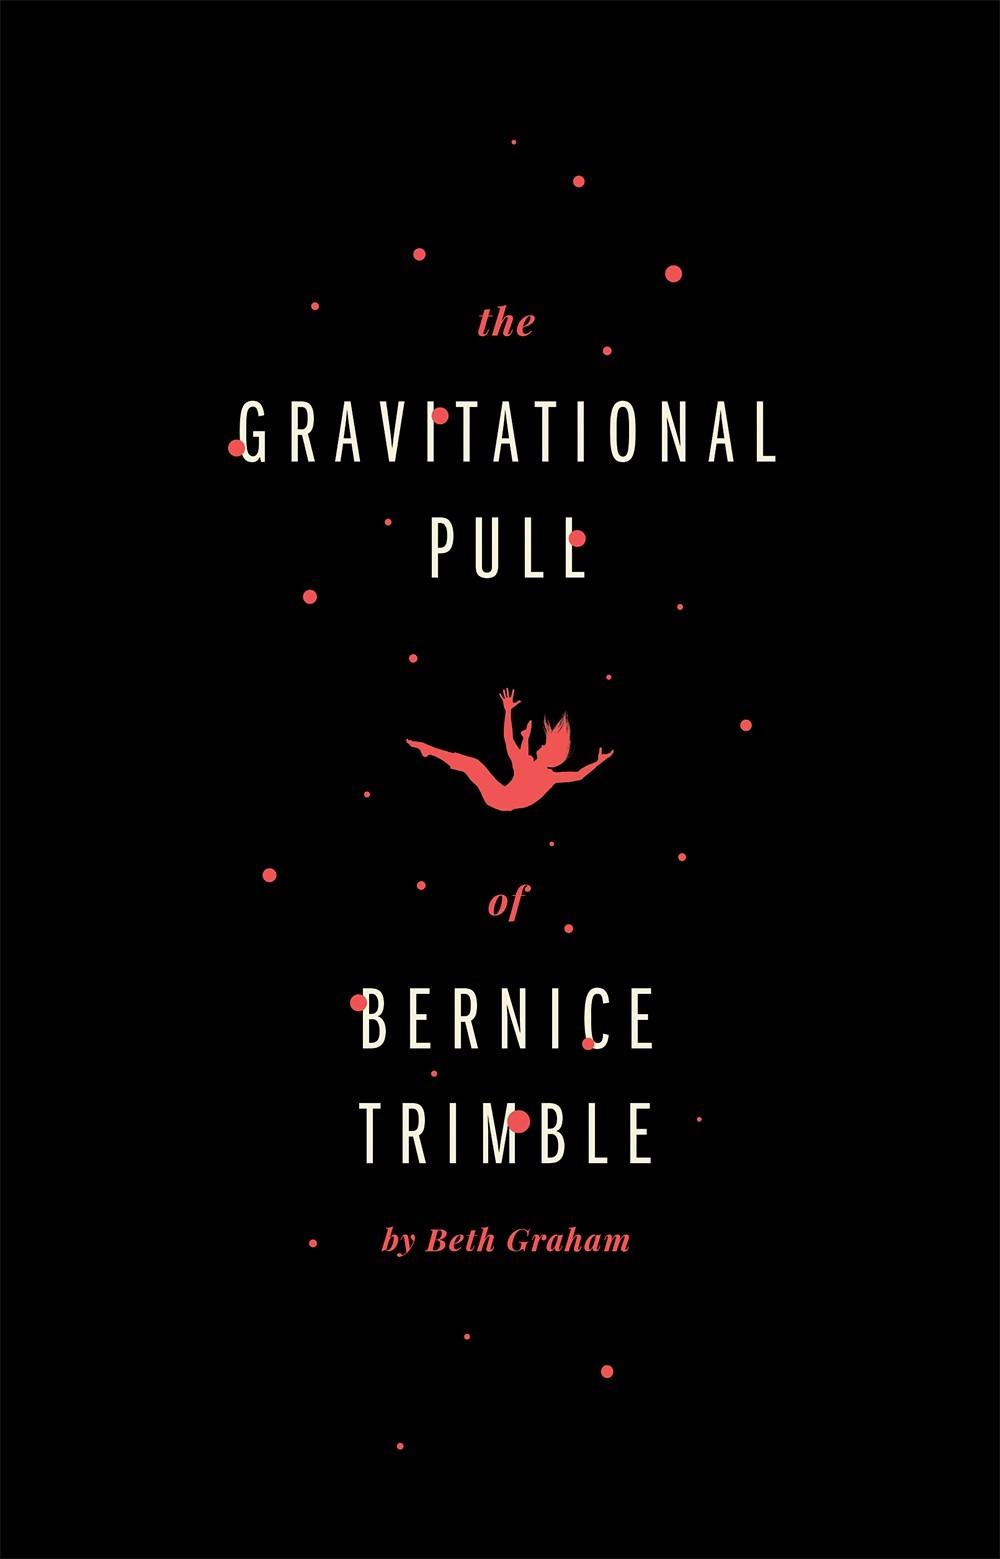 The Gravitational Pull of Bernice Trimble (ebook)